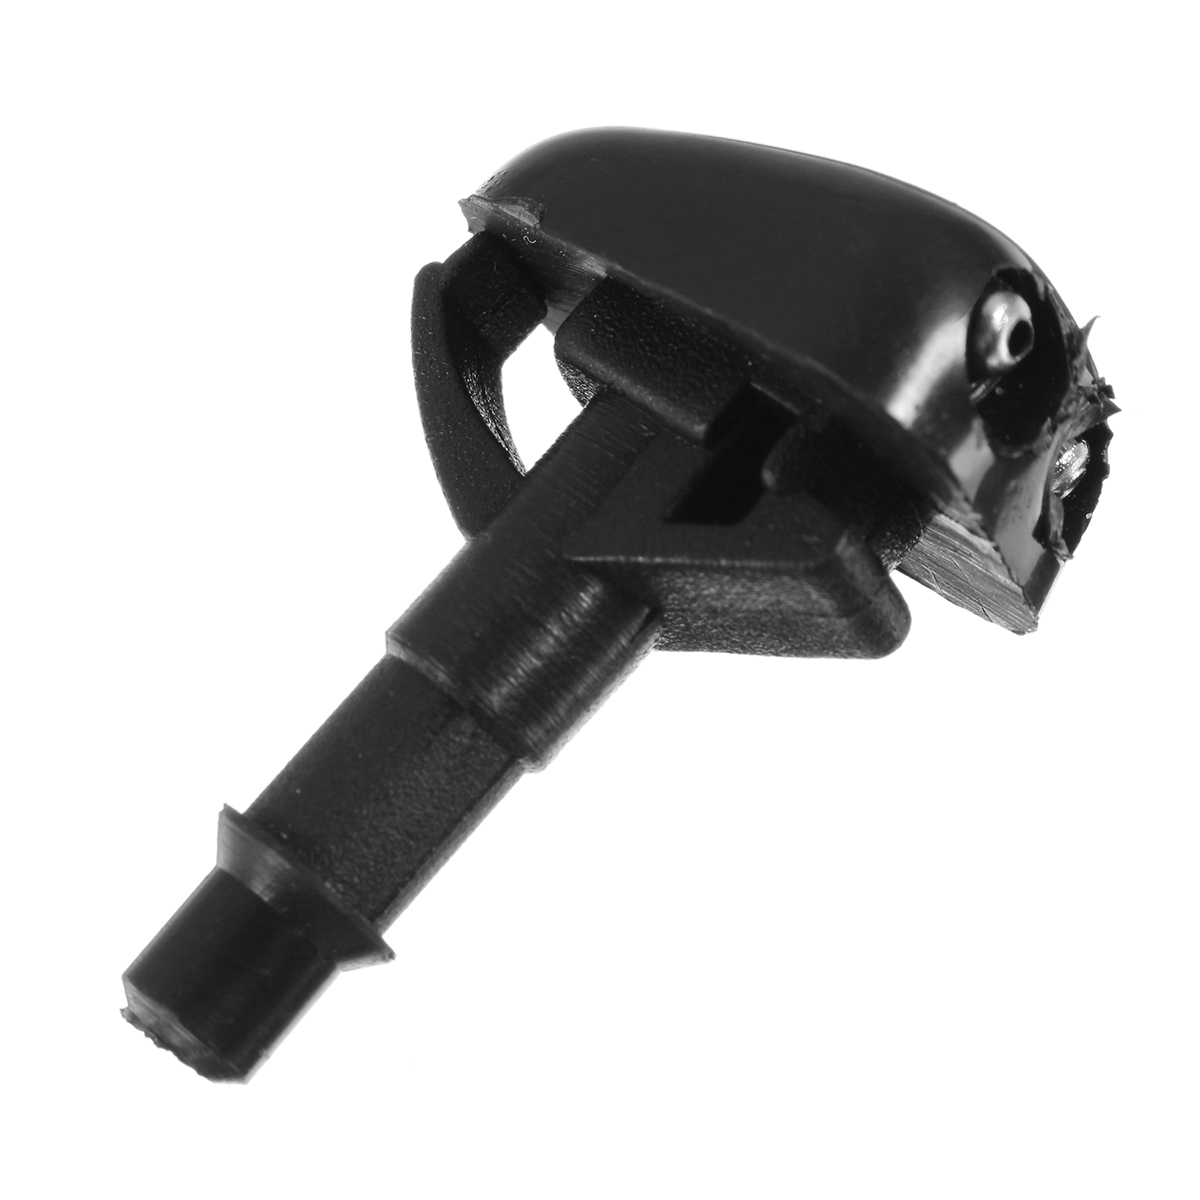 Car Windshield Wiper Washer Spray Nozzle For Mitsubishi Pajero V31 V33 V73